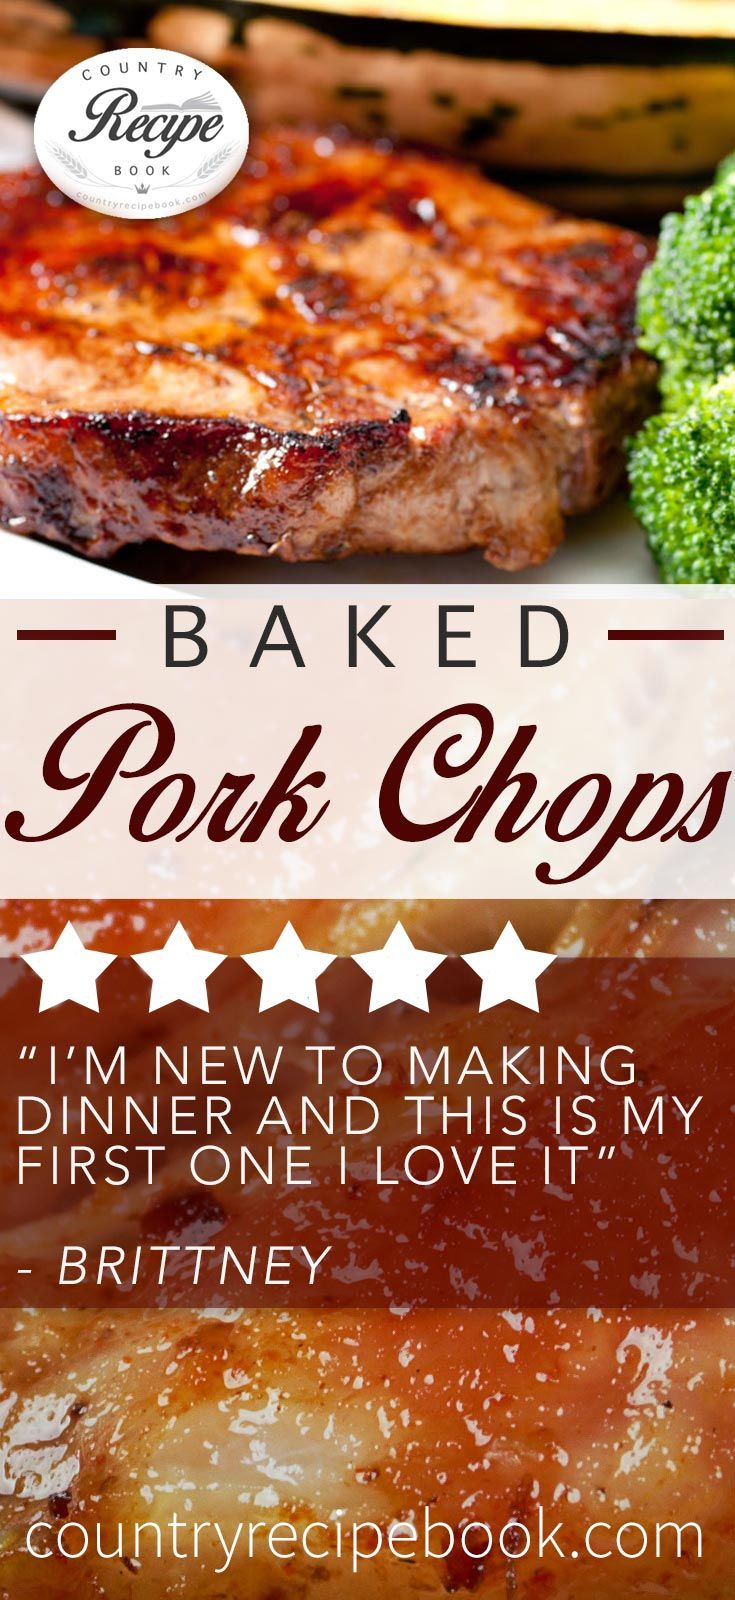 Country Style Baked Pork Chops Recipe Pork Recipes Baked Pork Food Recipes